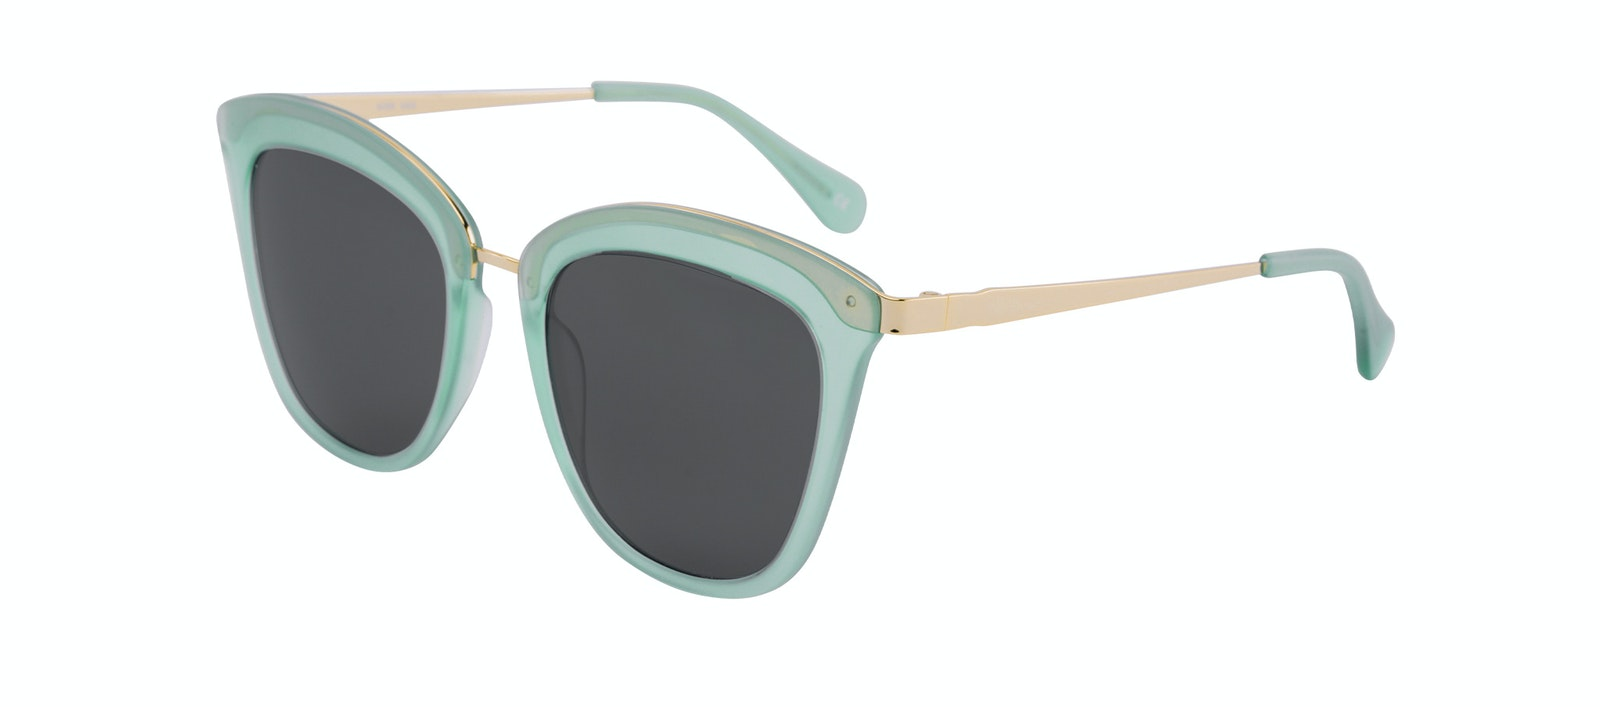 Affordable Fashion Glasses Cat Eye Sunglasses Women More Sage Tilt